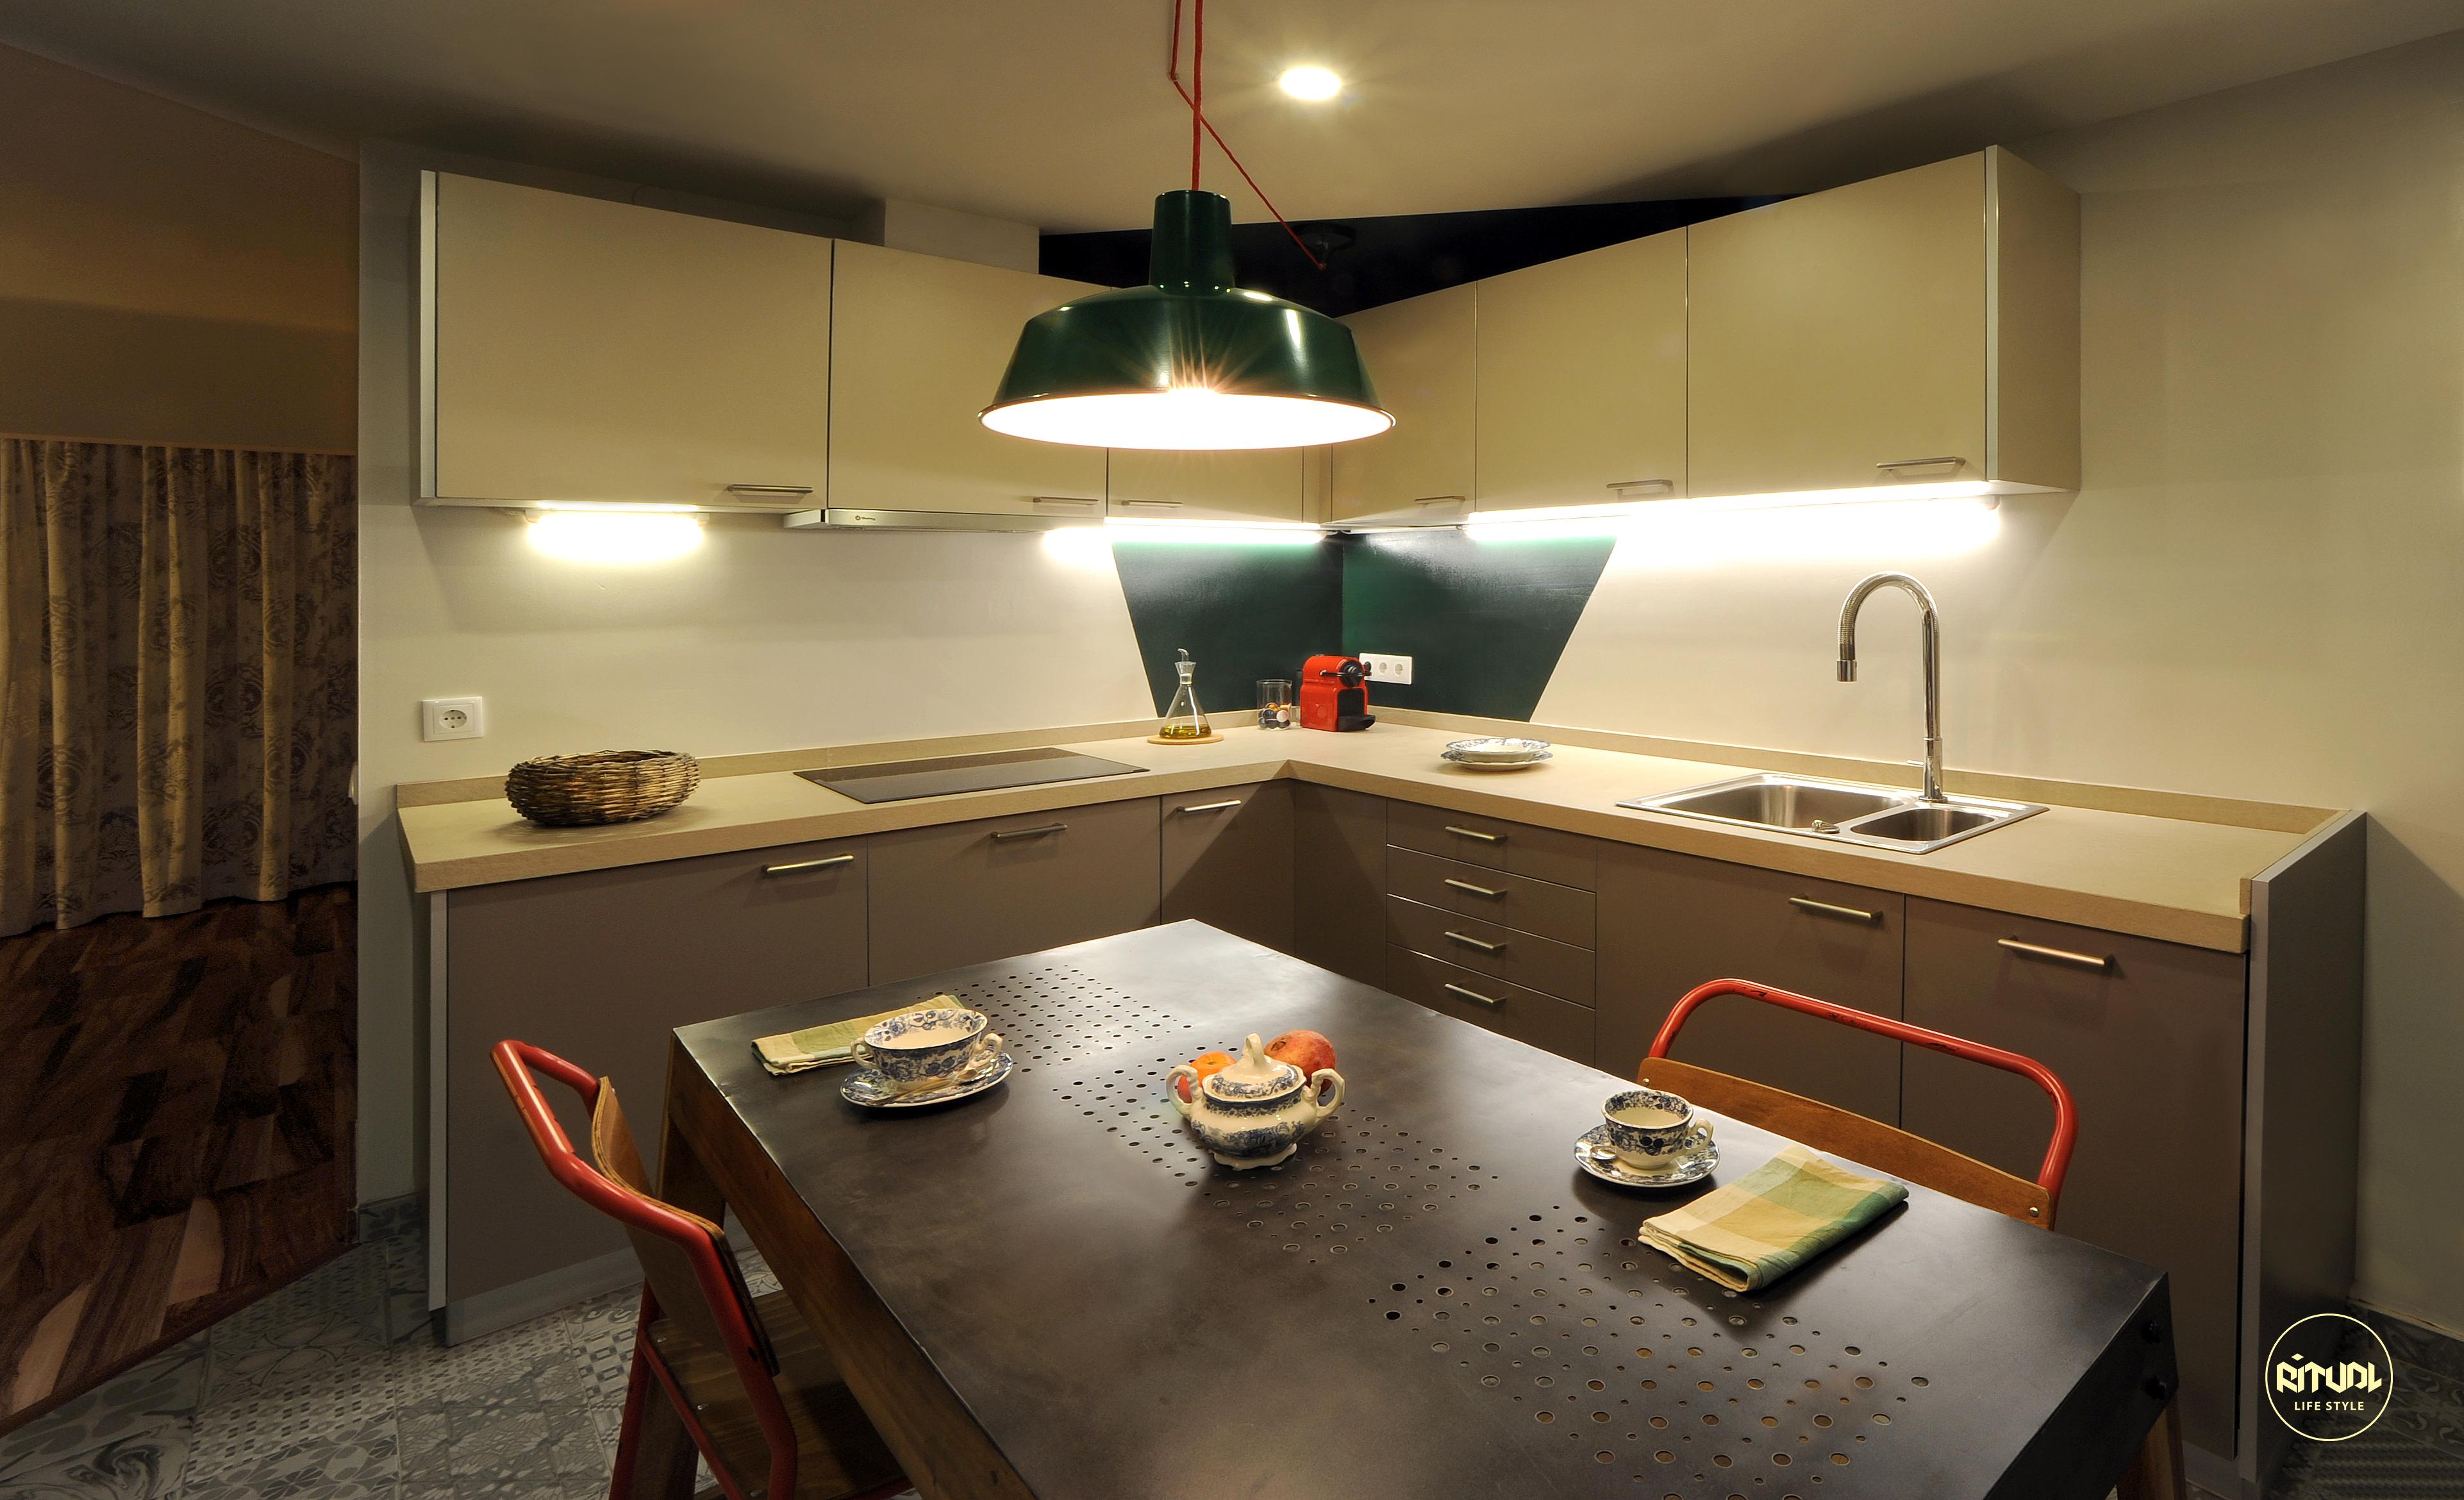 Home remodel architect in Barcelona